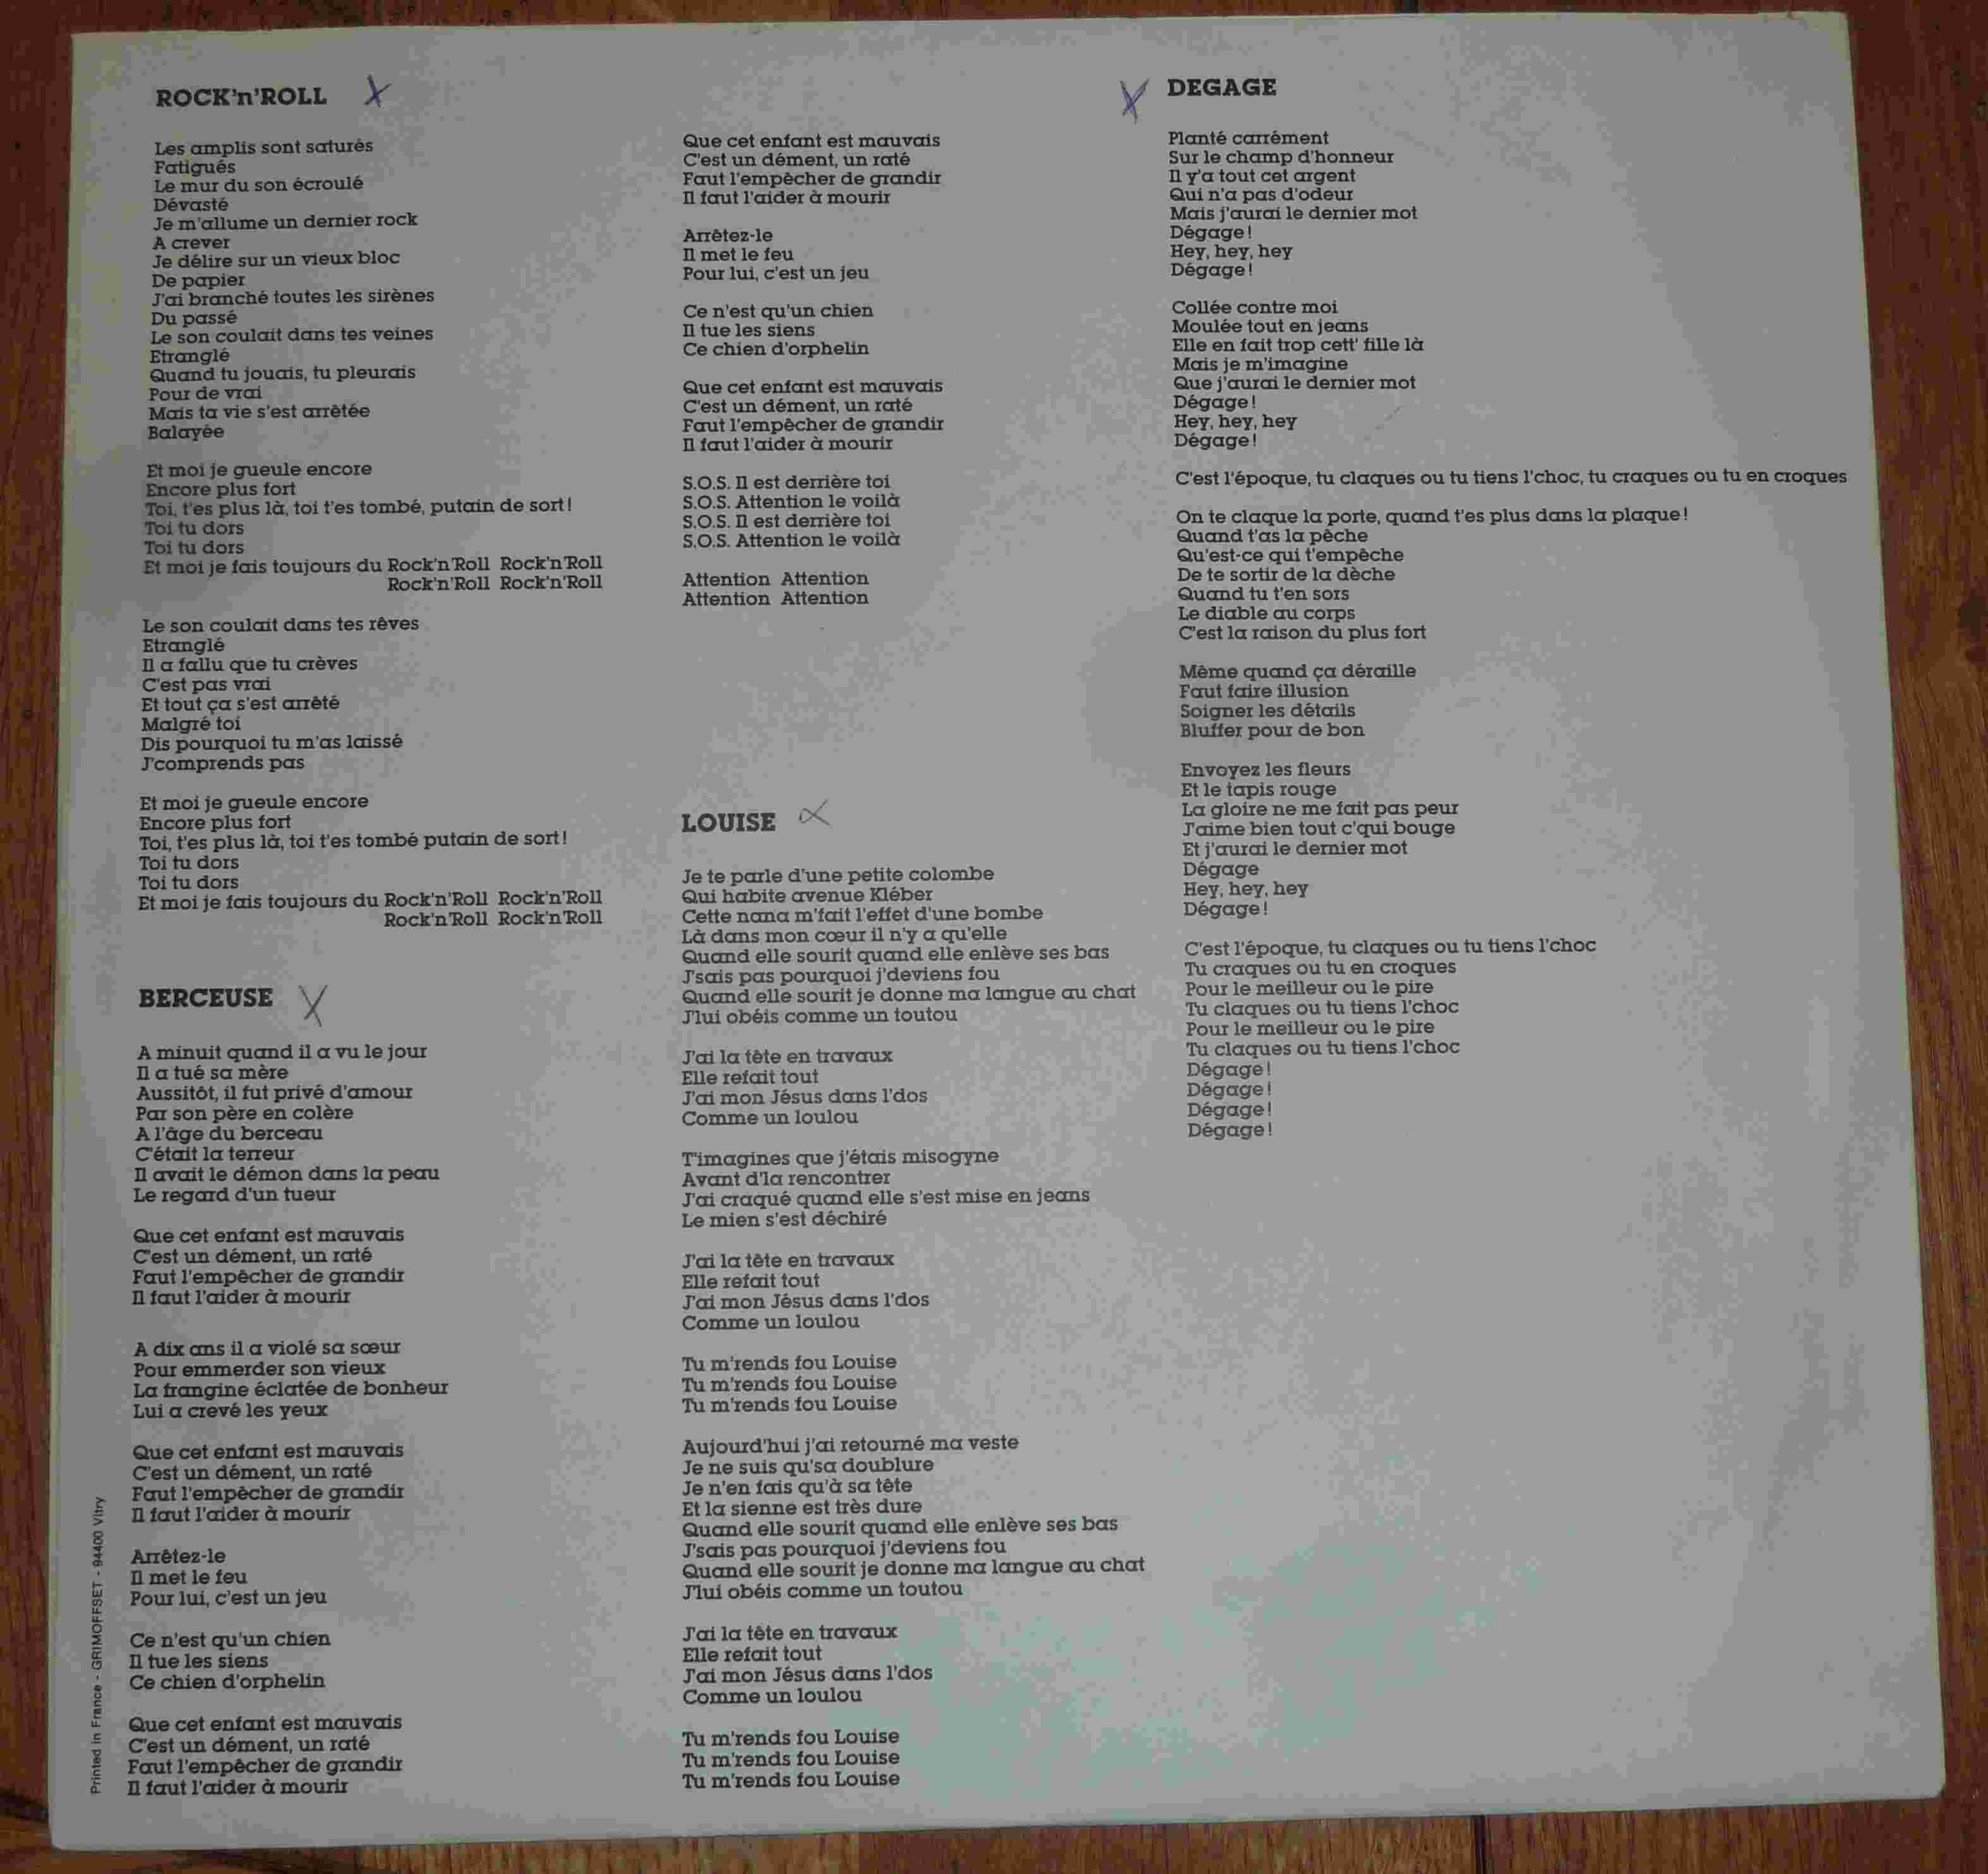 OCEAN Ocean (1981) Toutes les paroles de l'album ... P1170426